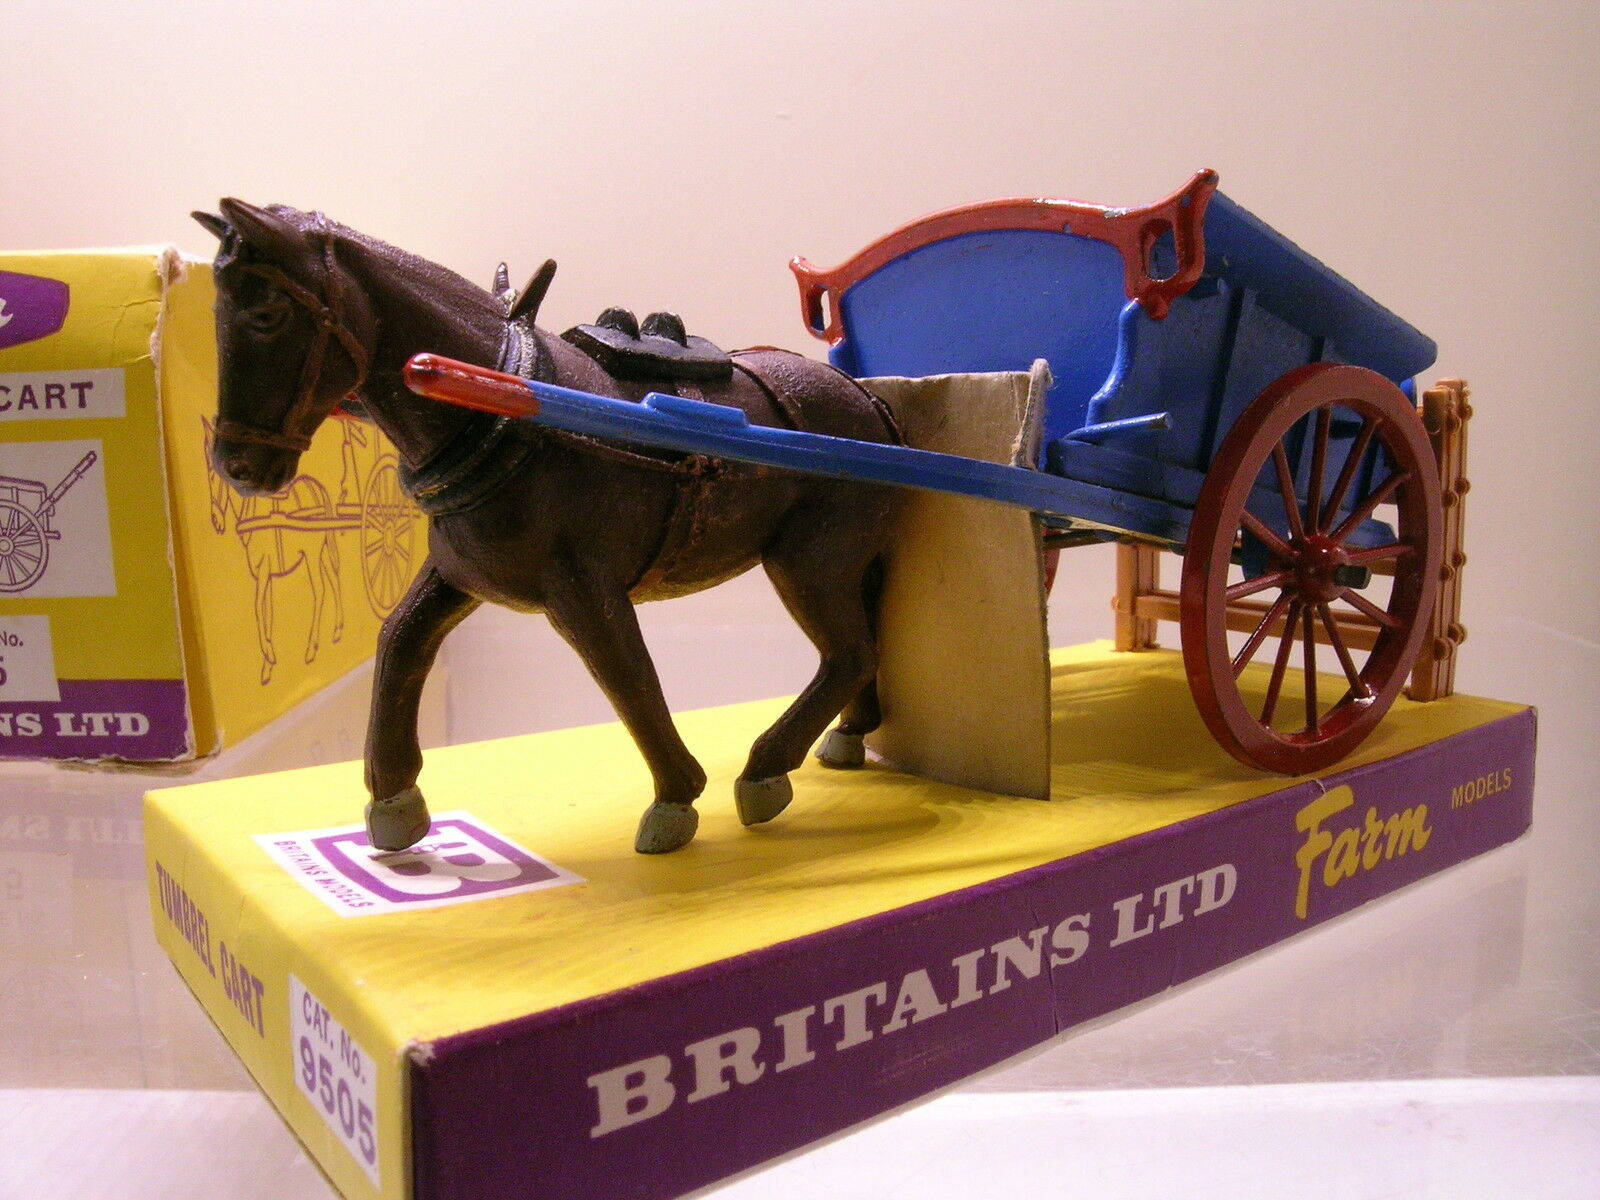 Country betriebsmodellen bespannten tumbrel wagen blau   rot   braun boxed 1  32